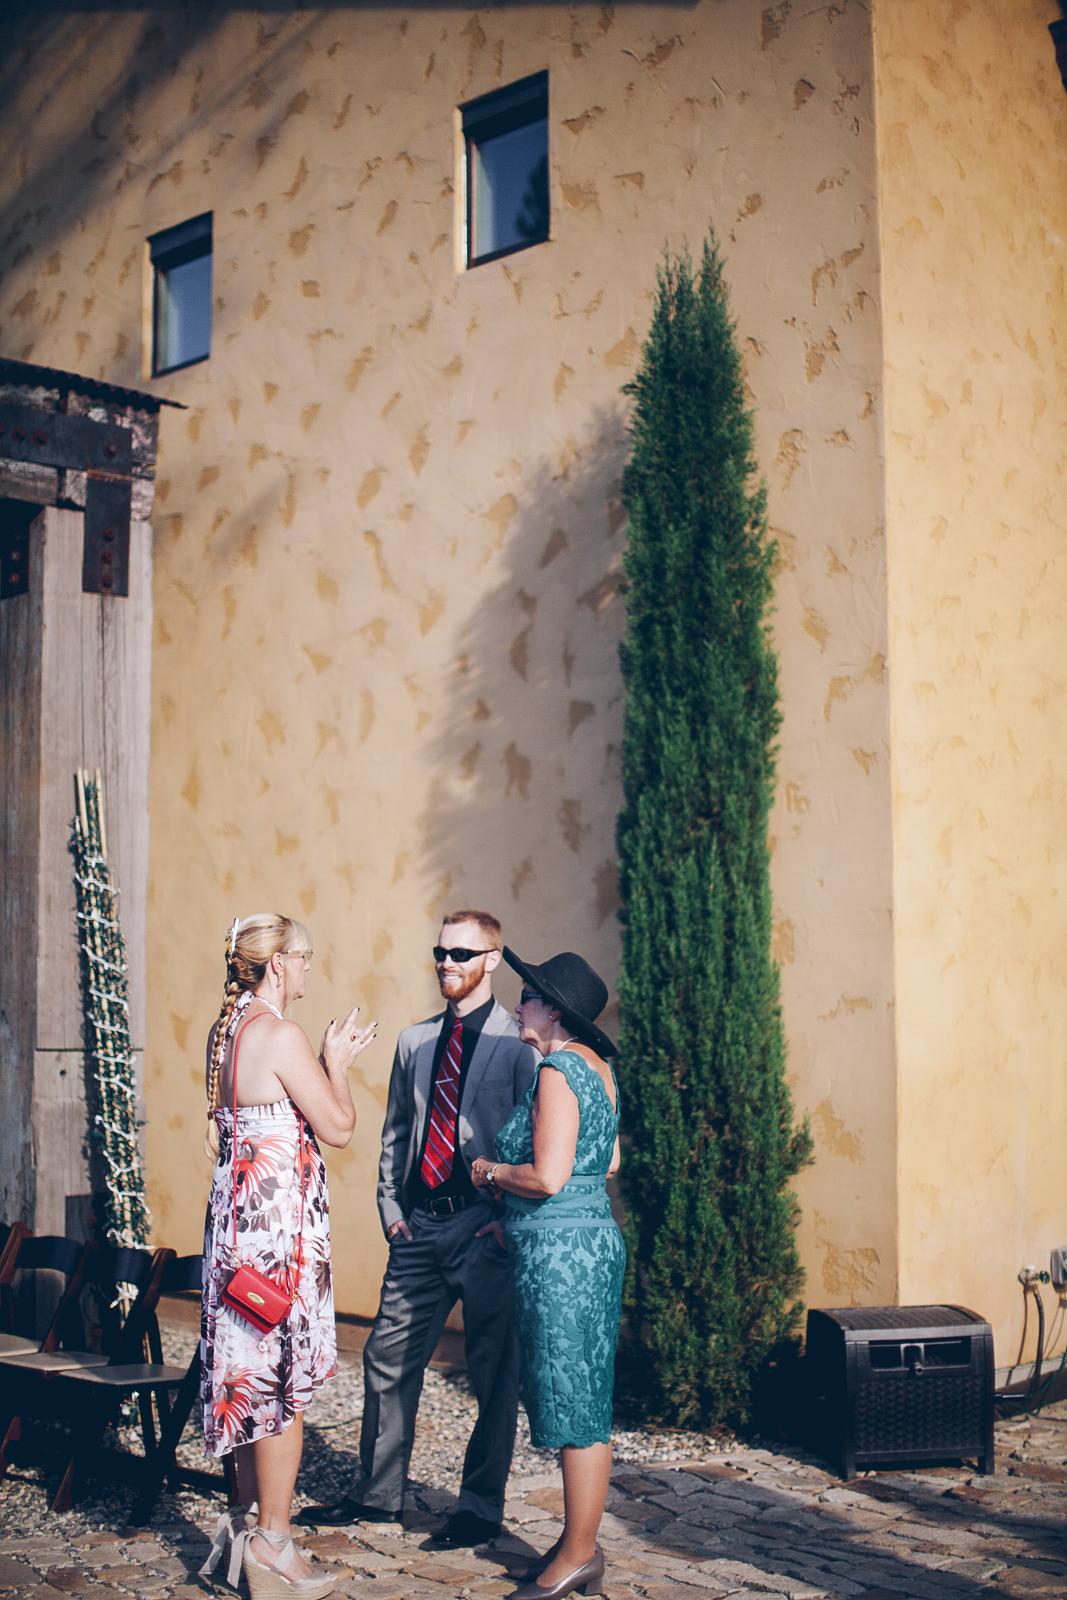 miraflores_winery_wedding_photography_ian_melissa_ebony_siovhan_bokeh_photography_21.jpg